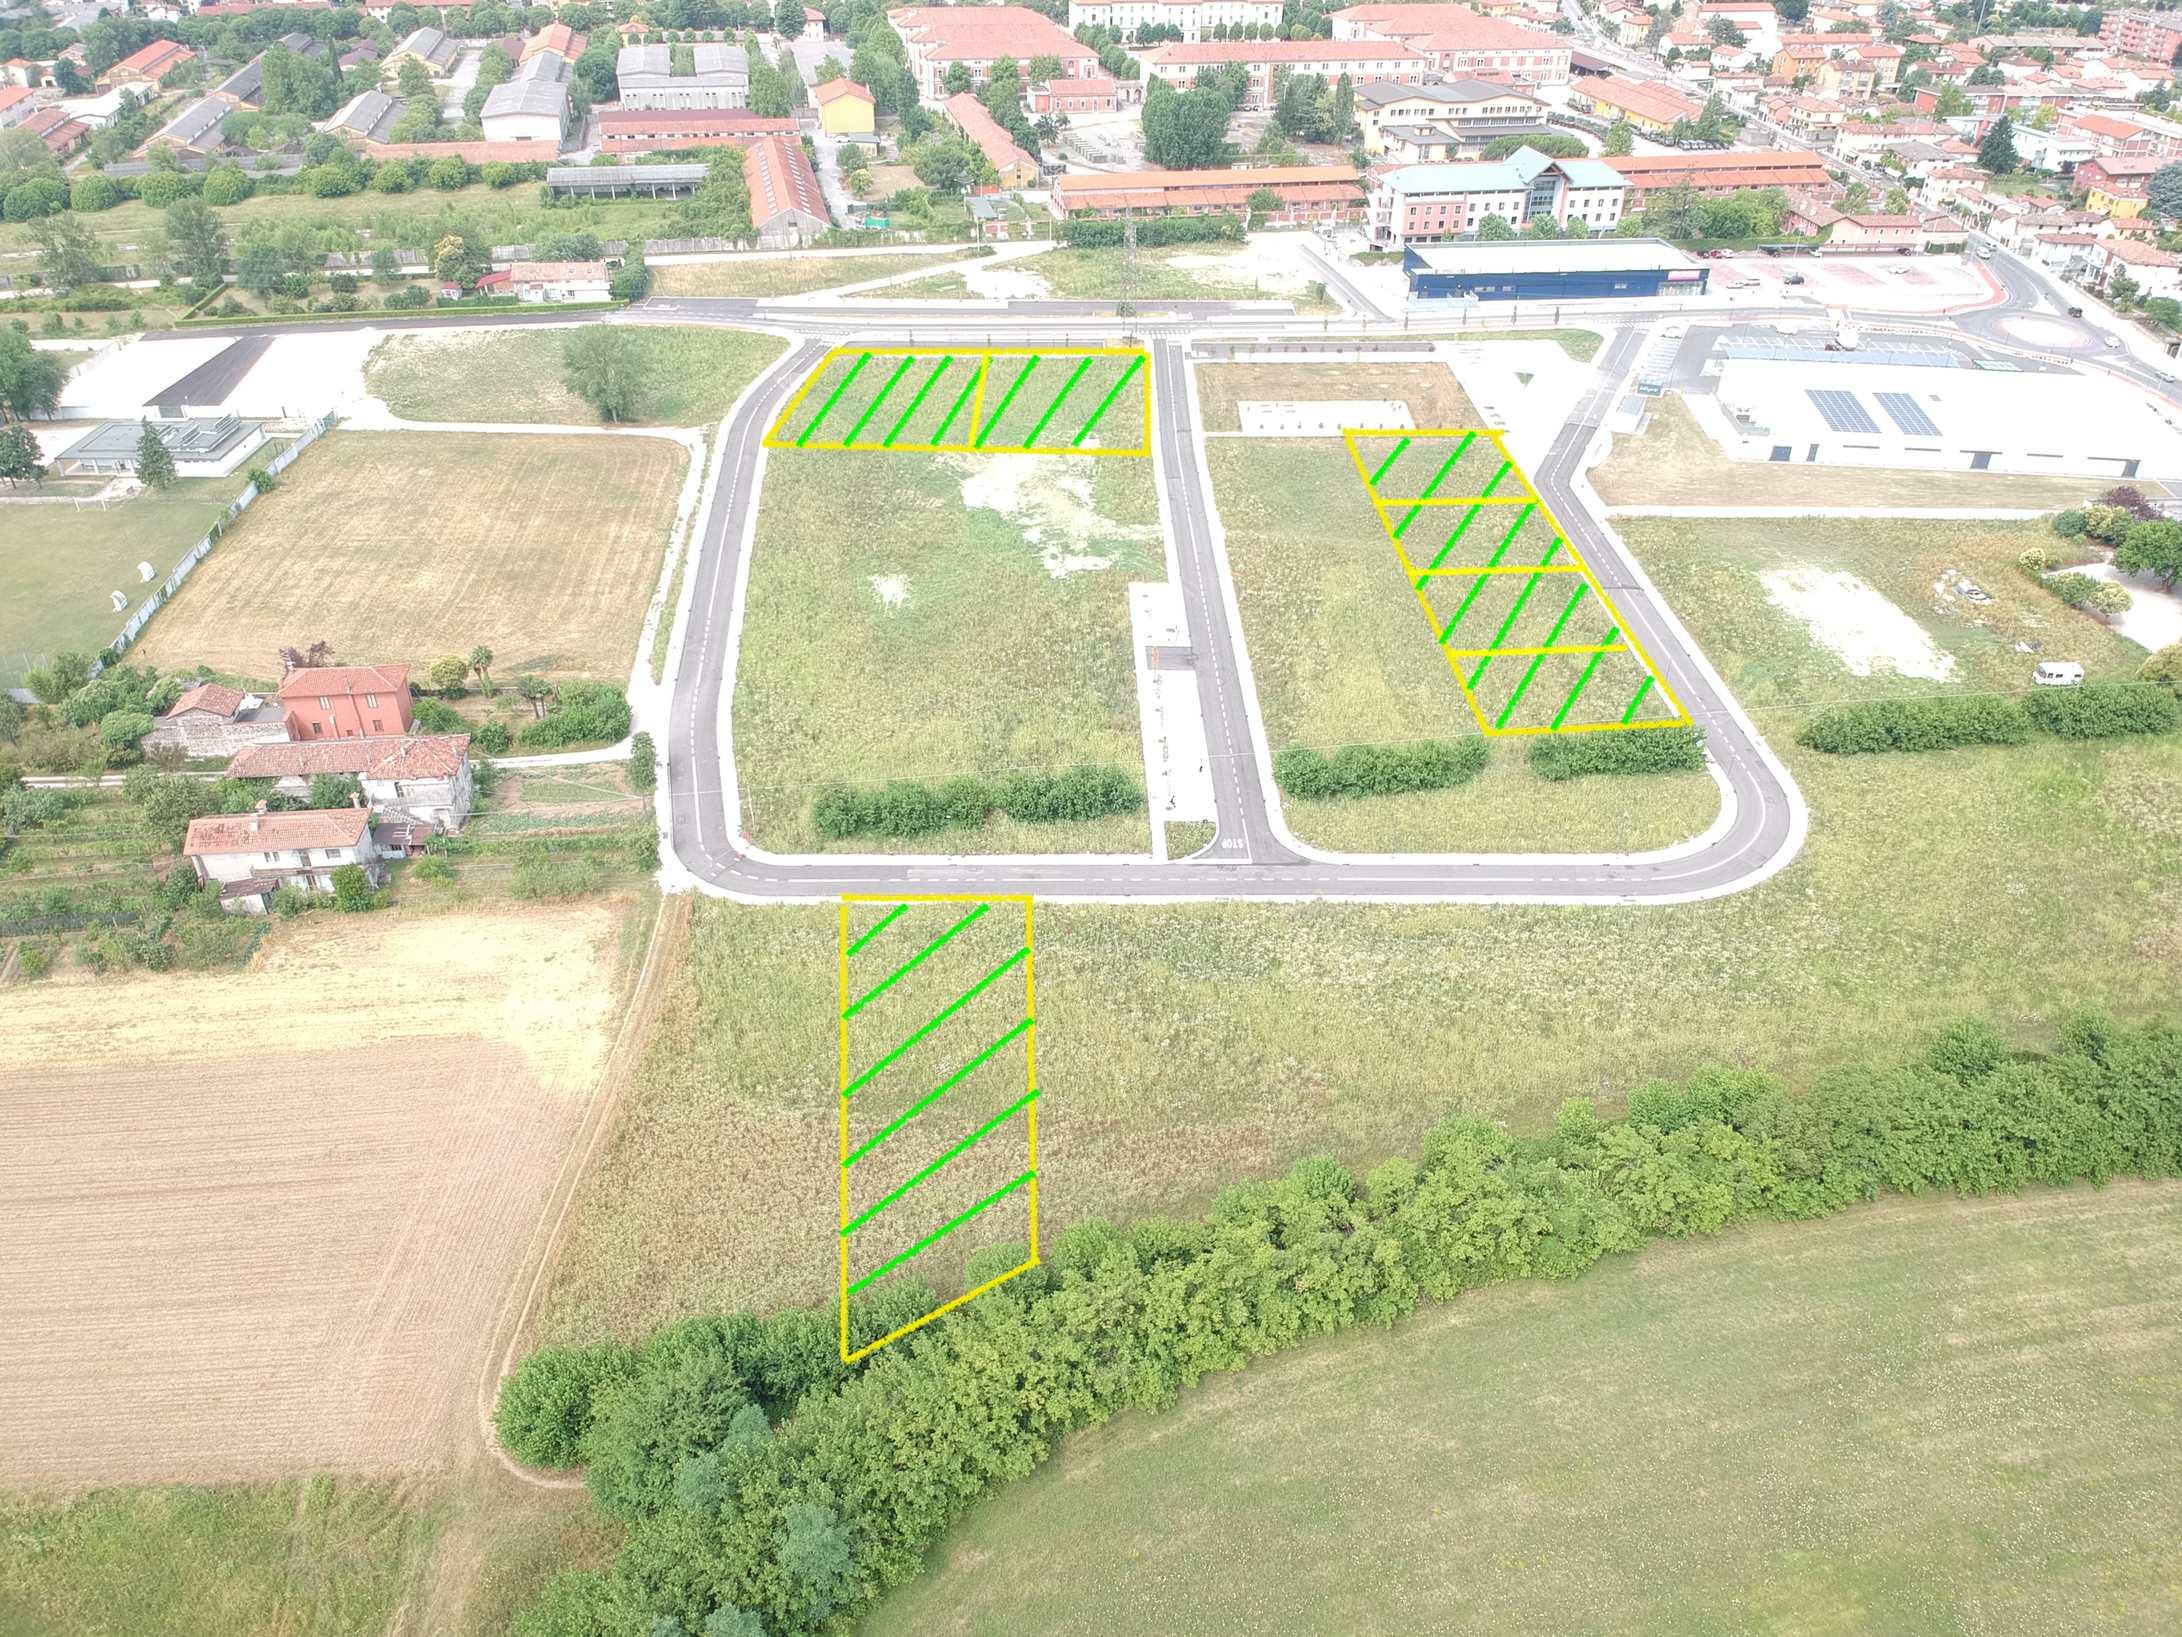 Terreni residenziali da 612mq